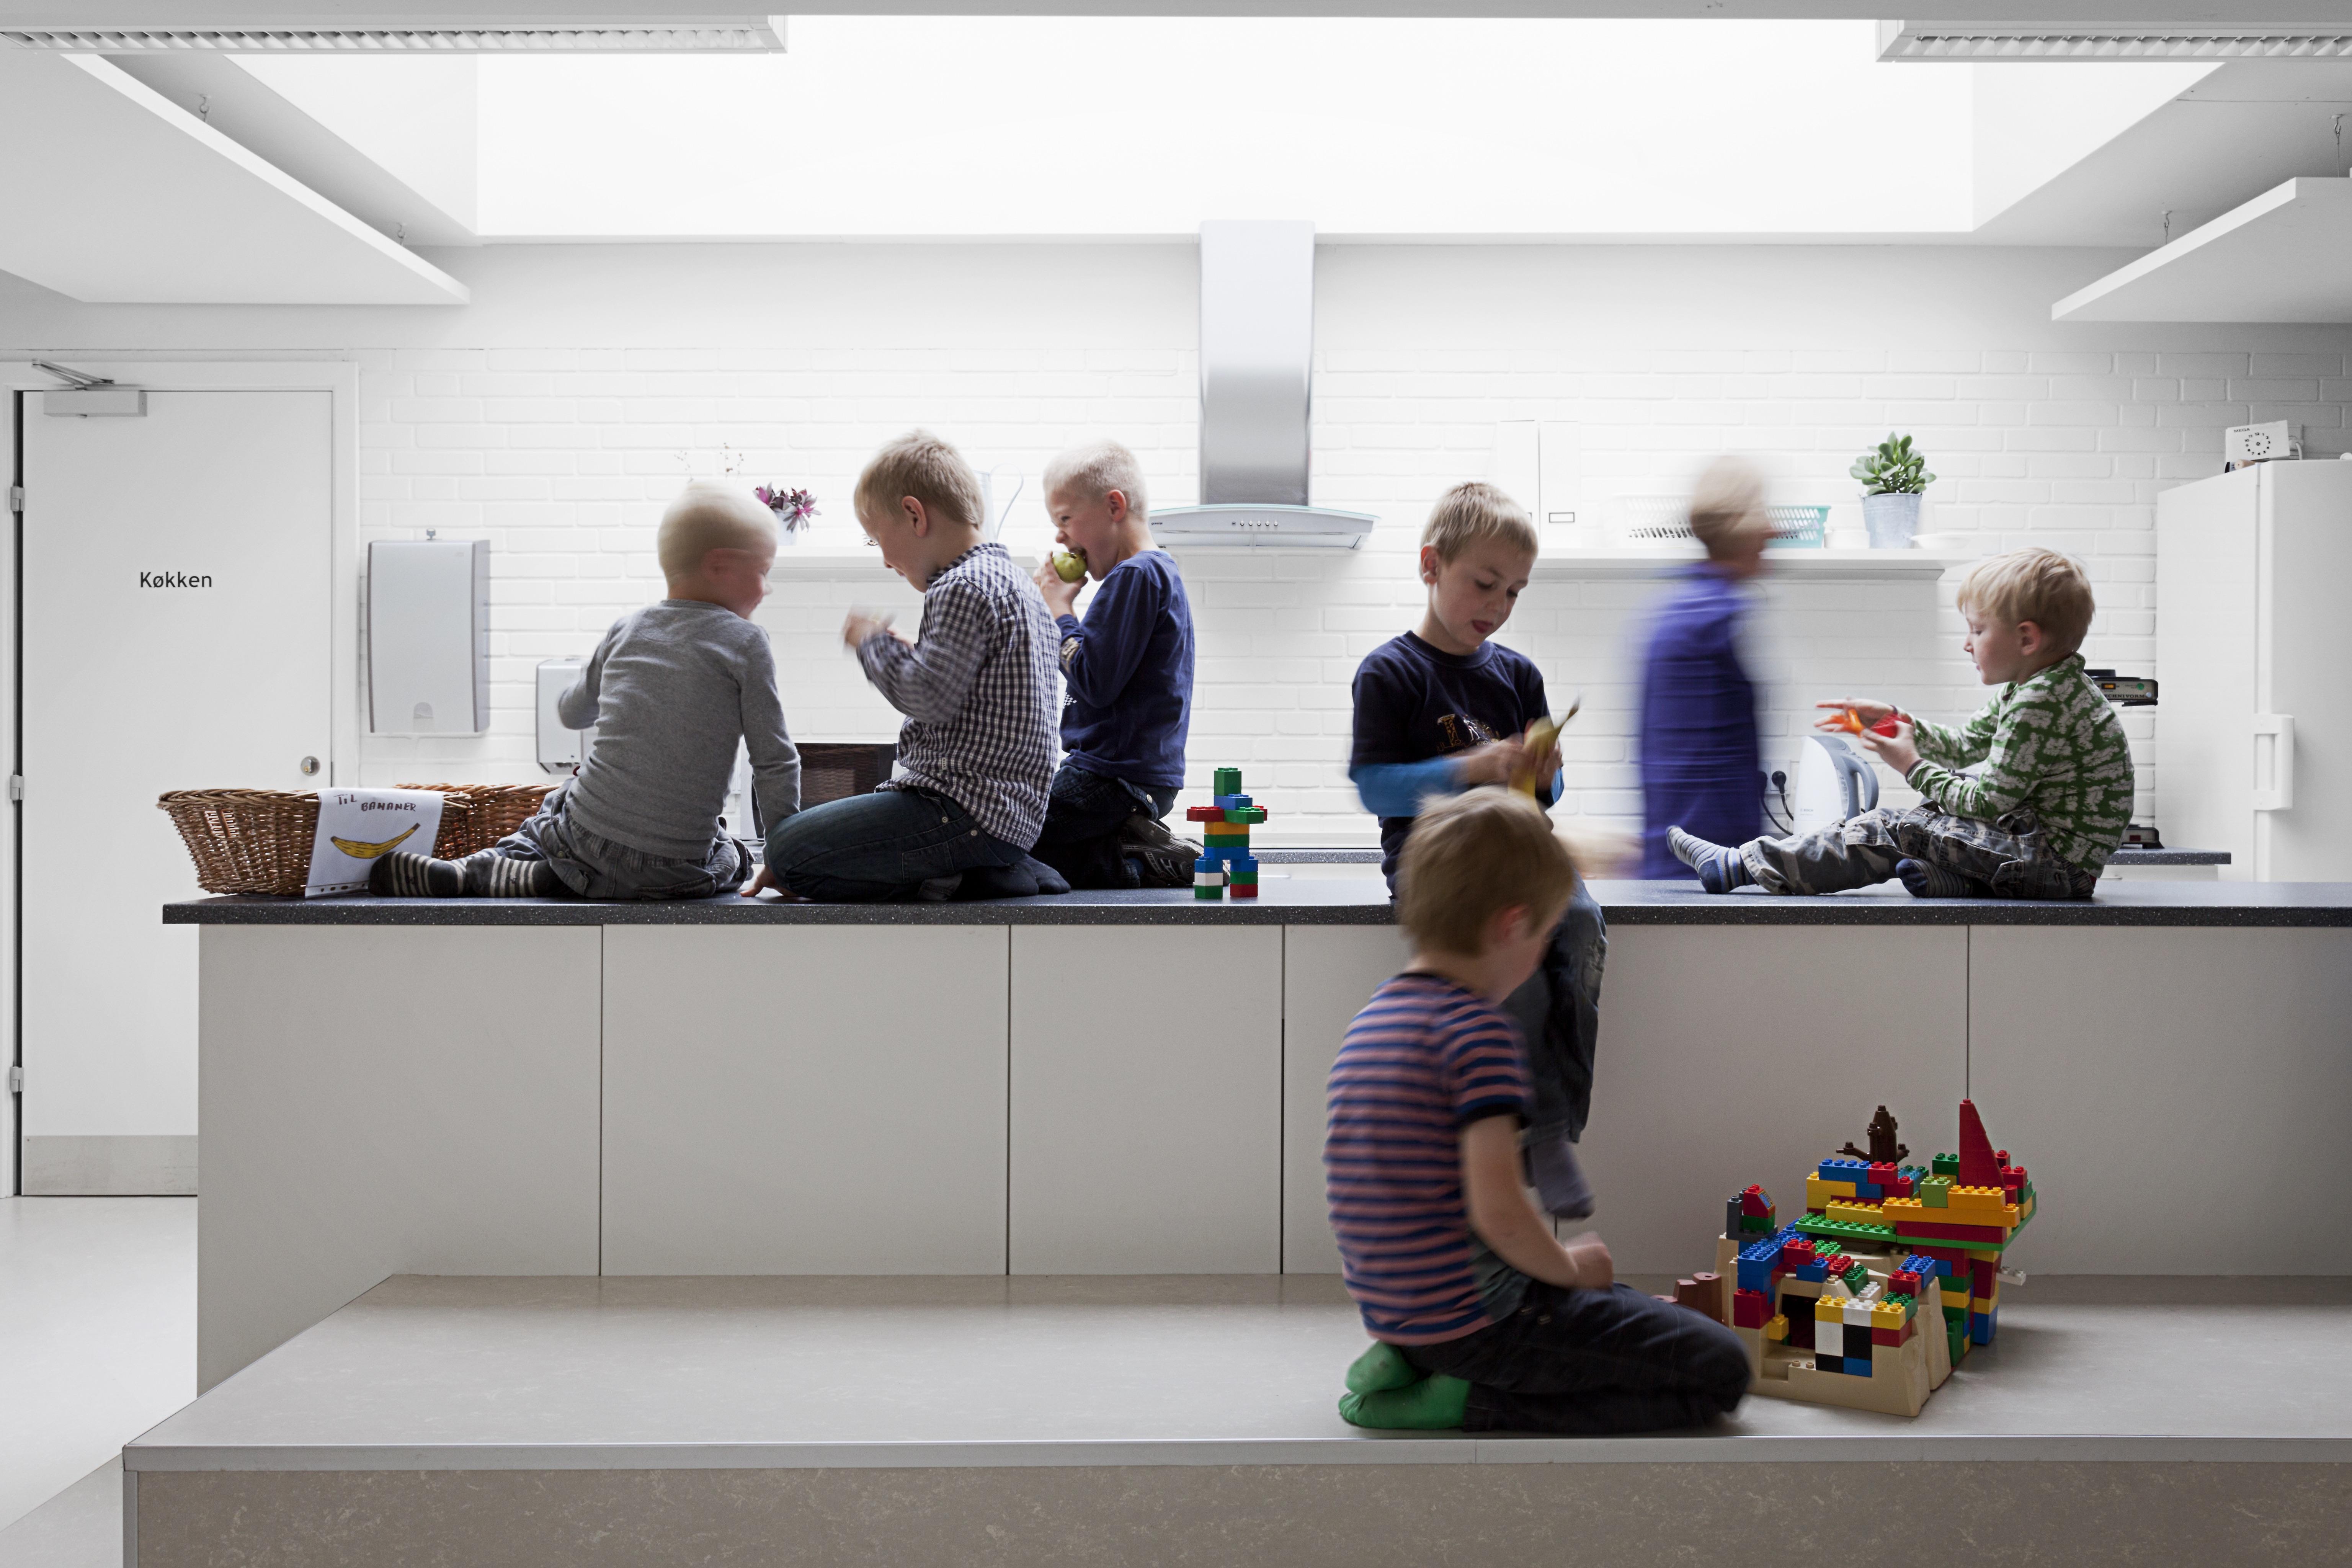 Stimulating children with school design and architecture